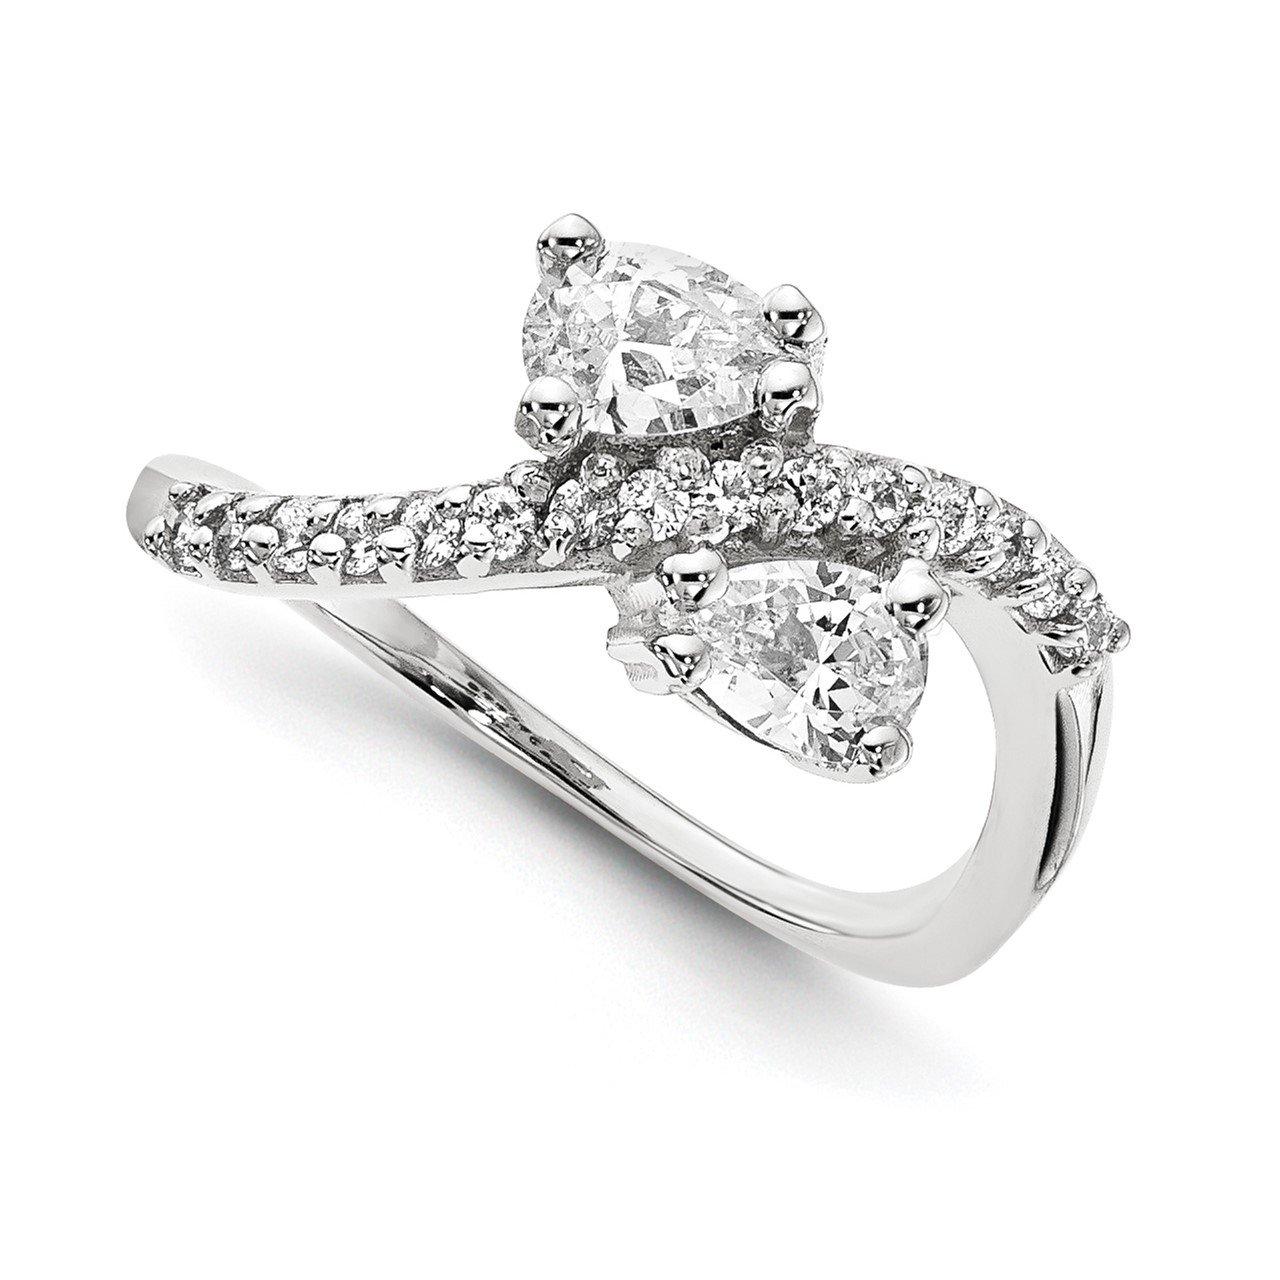 14KW A Diamond 2-stone Ring Semi-Mount - 5x3 mm center stones